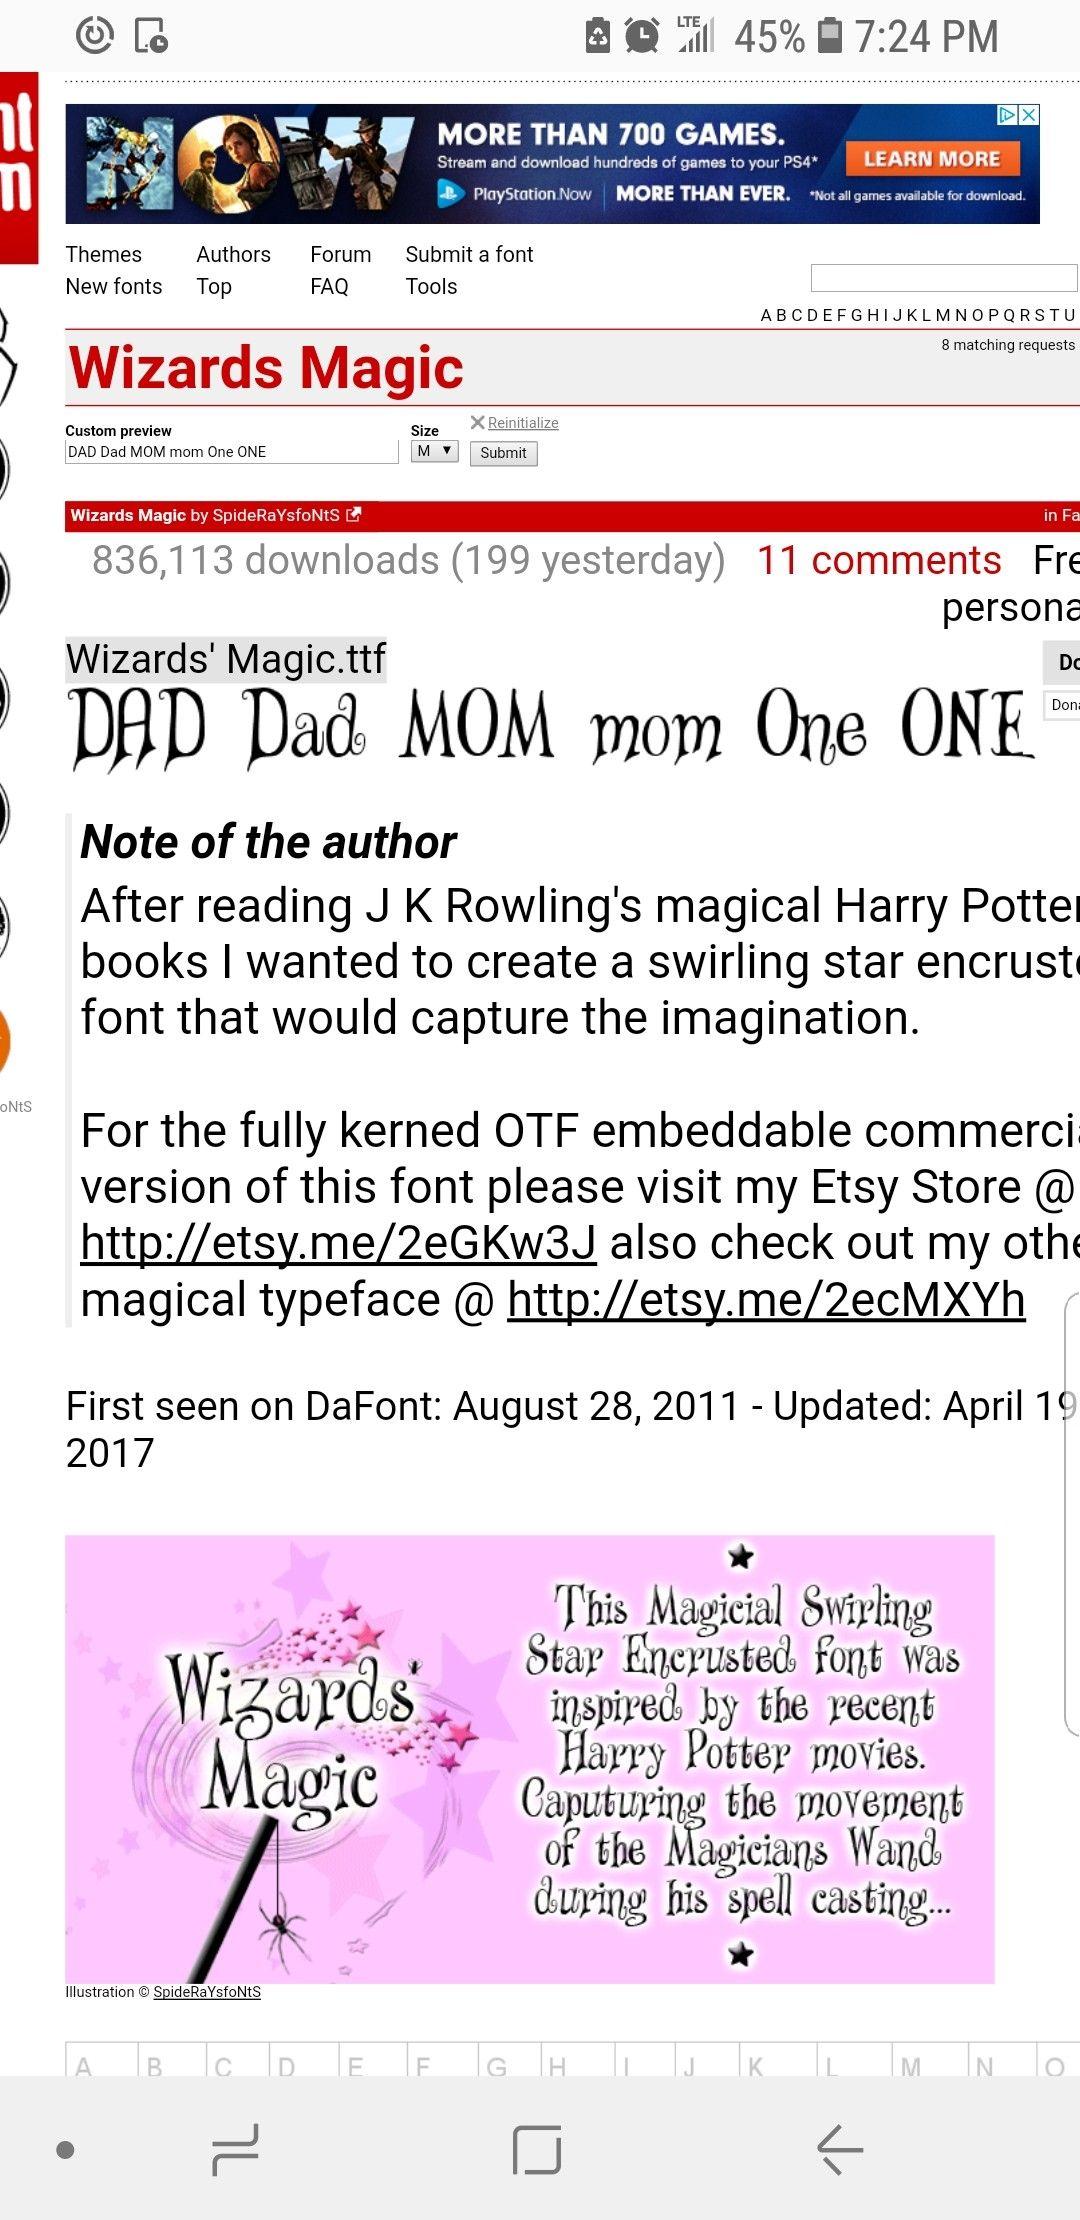 Harry Potter Books Image By Tasha Bundy On Cricut